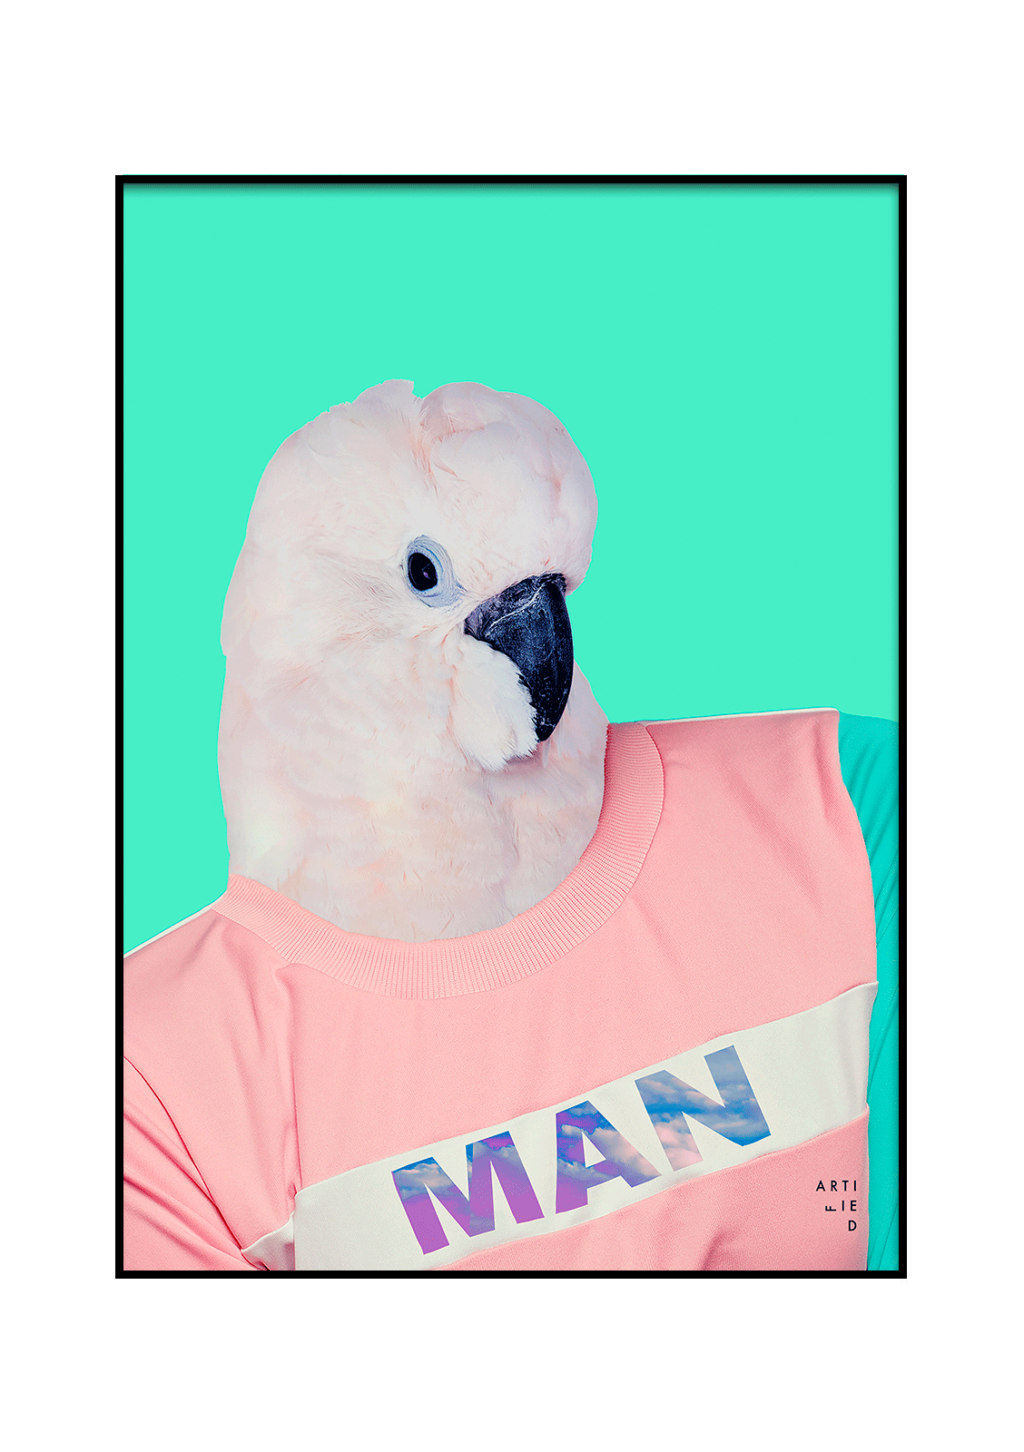 birdman poster fra artified